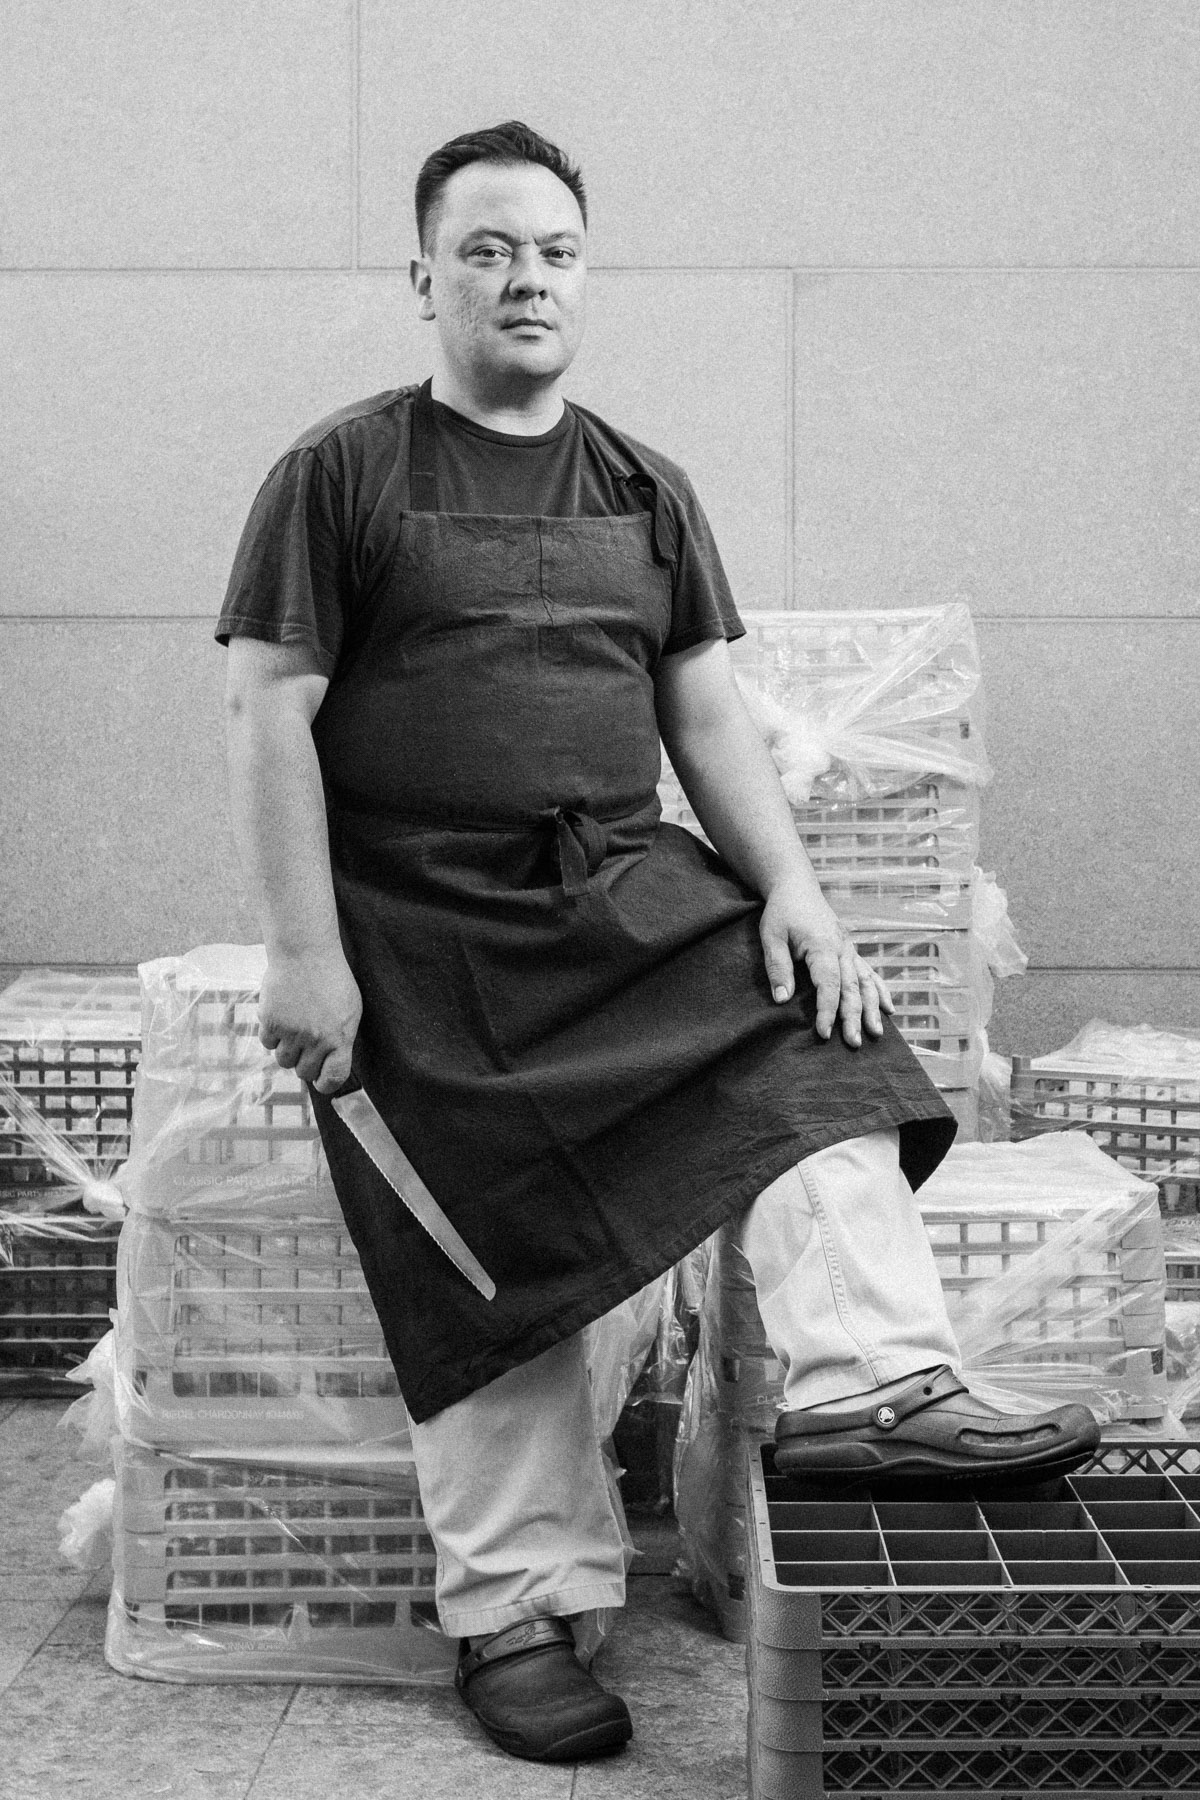 15. Chef Steve Kling / Five Crowns / Corona Del Mar, California